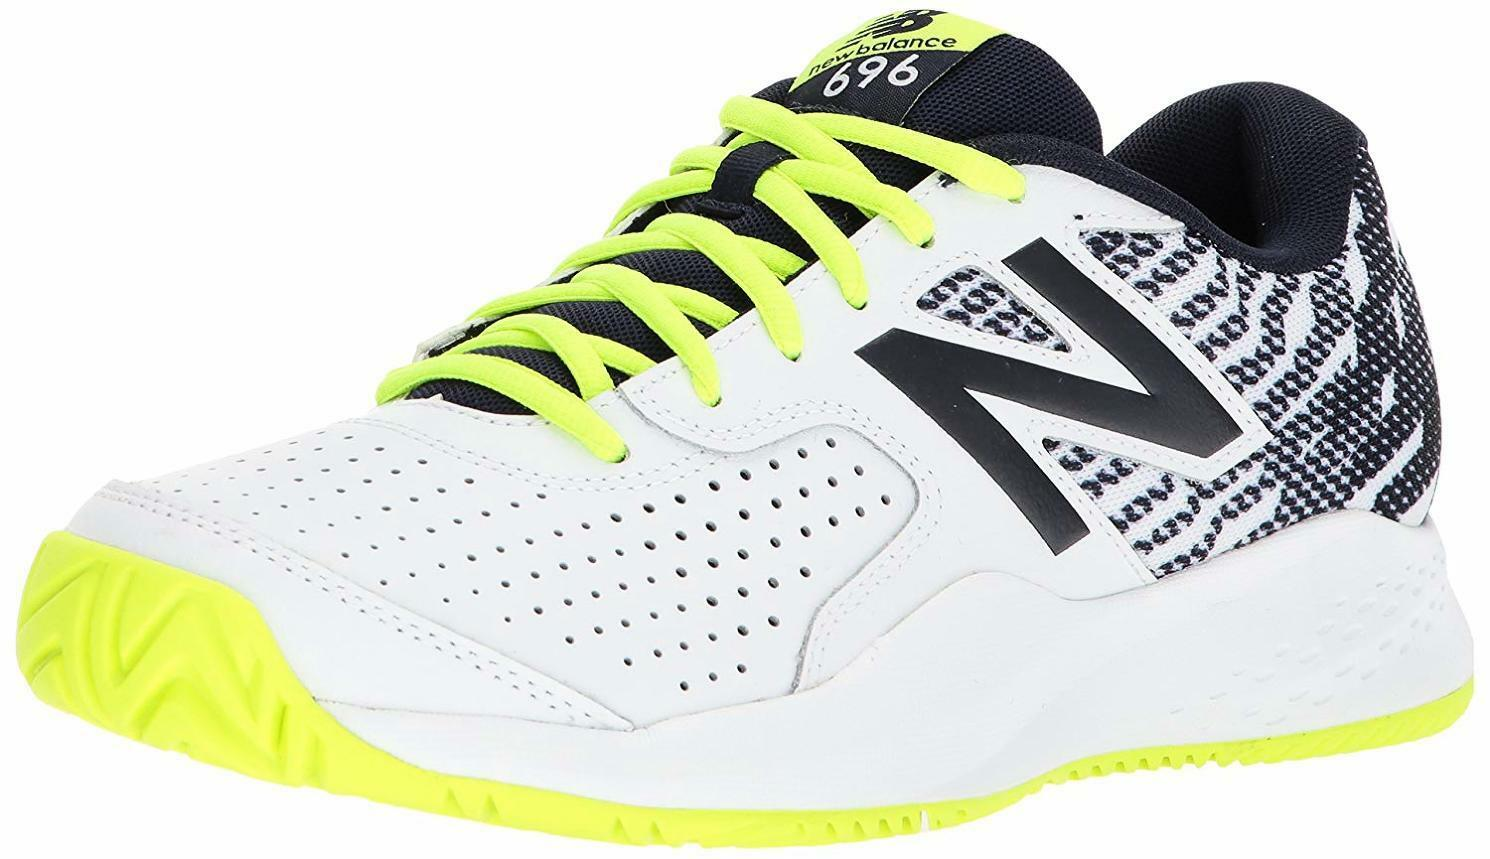 Tenis De Hombre 696v3 New Balance Zapato-elegir talla Color